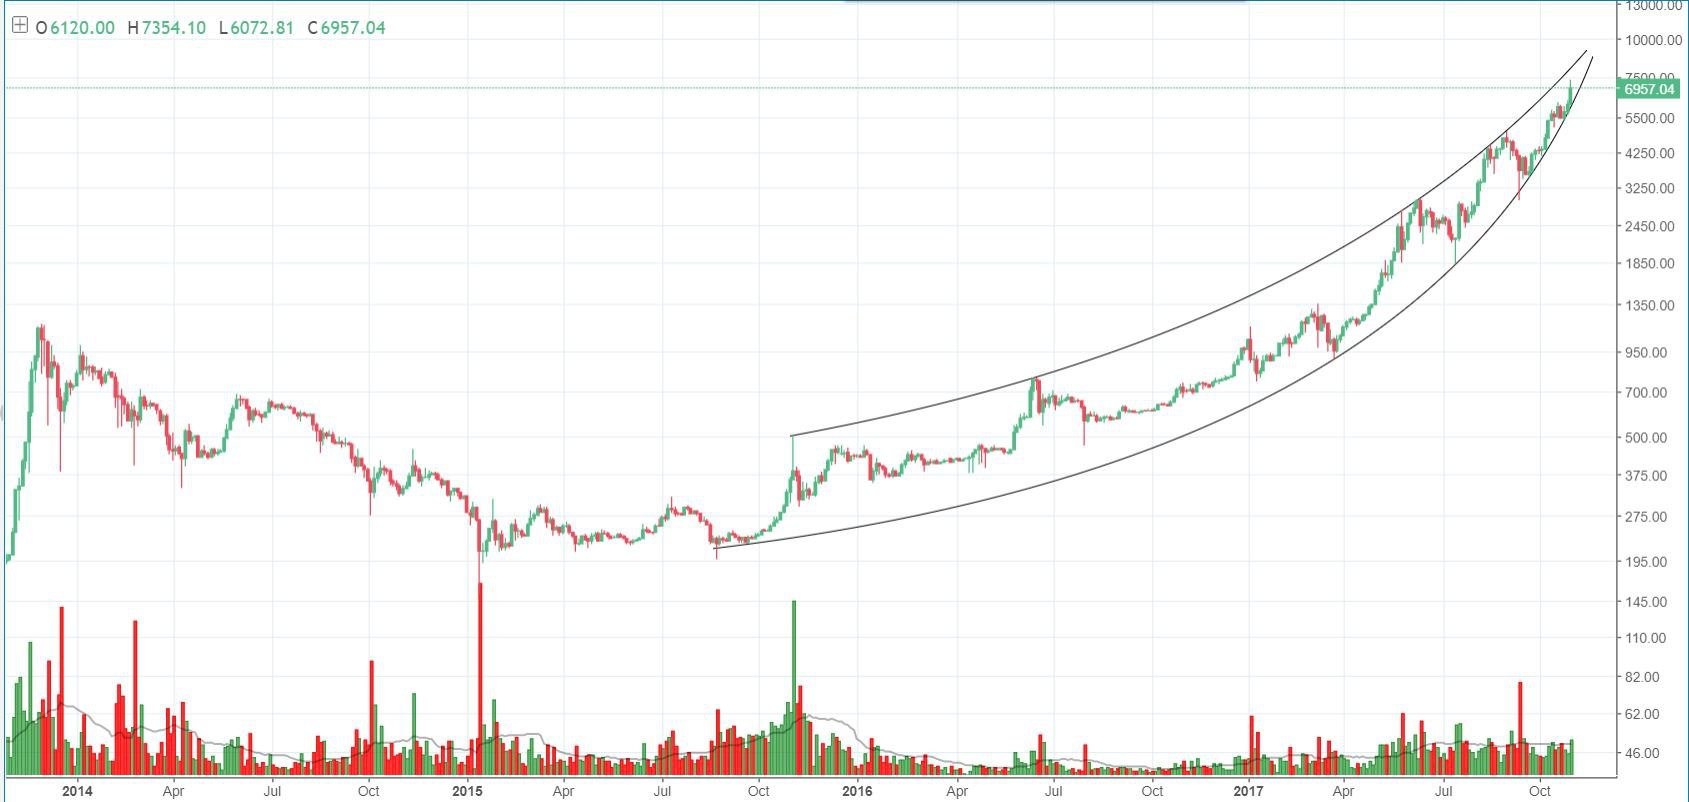 Bitcoin Price Analysis Bitcoins Parabolic Envelope Could Push To